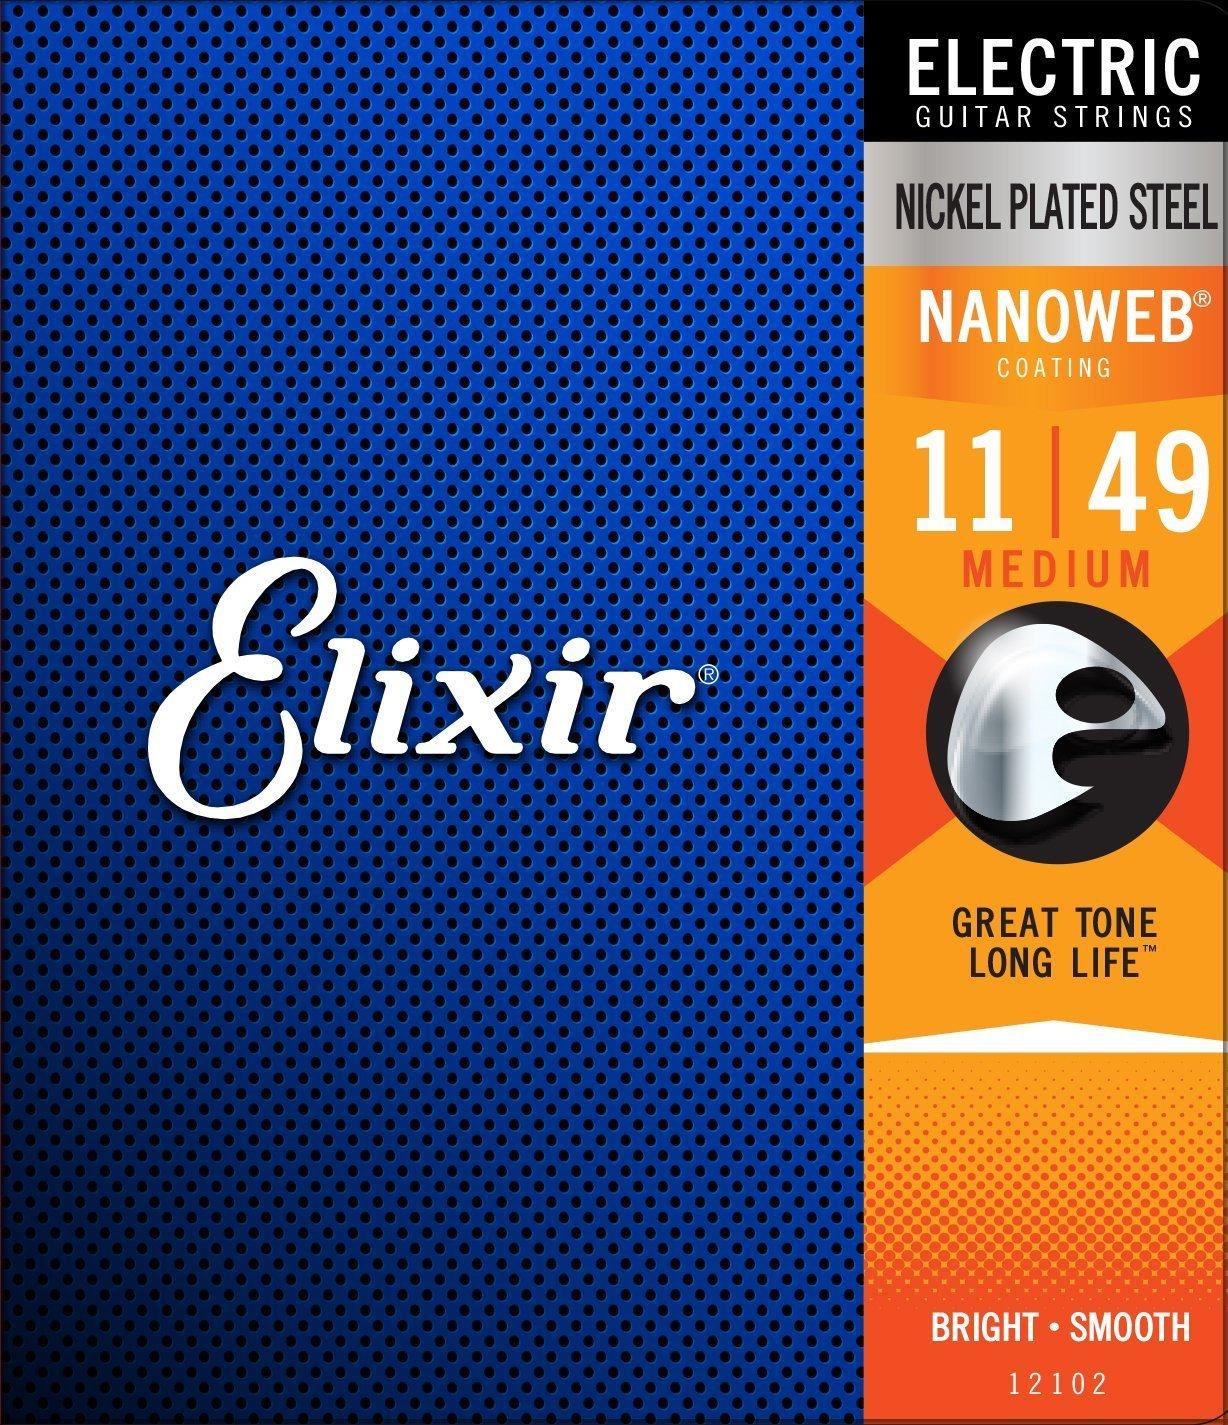 Elixir Nickel Plated Steel Nanoweb Electric, Medium